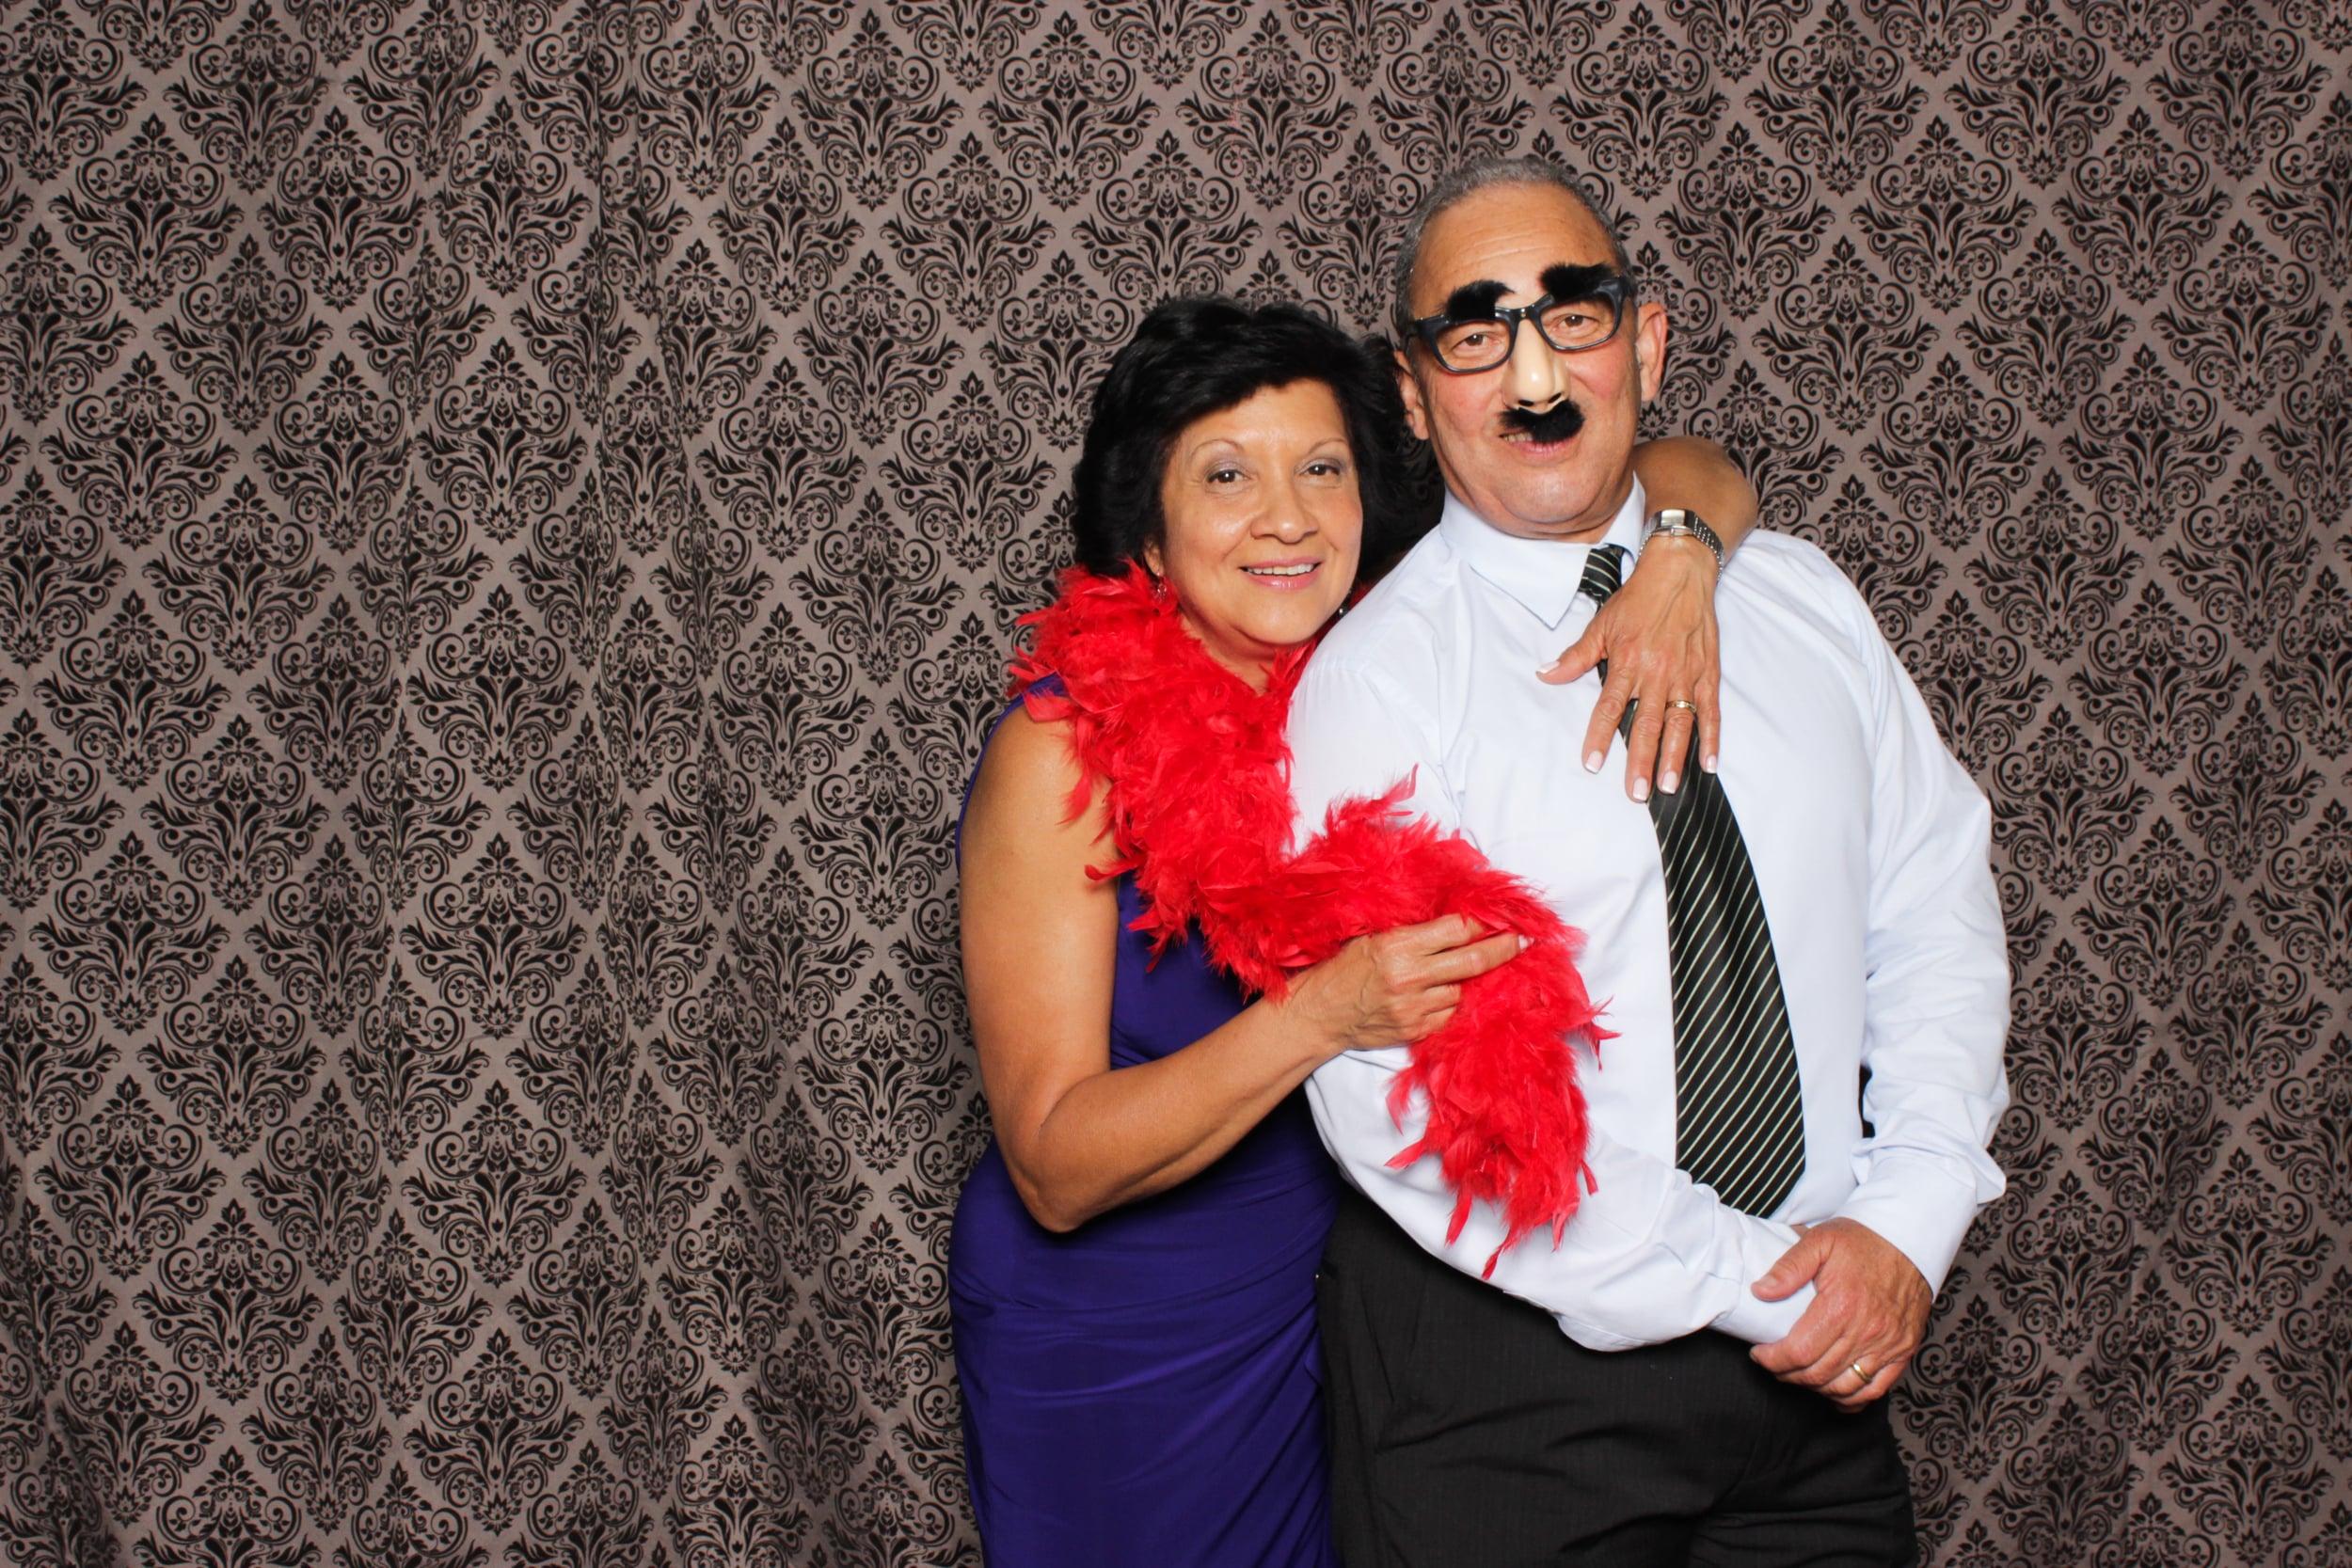 ottawa-wedding-photobooth-59.JPG